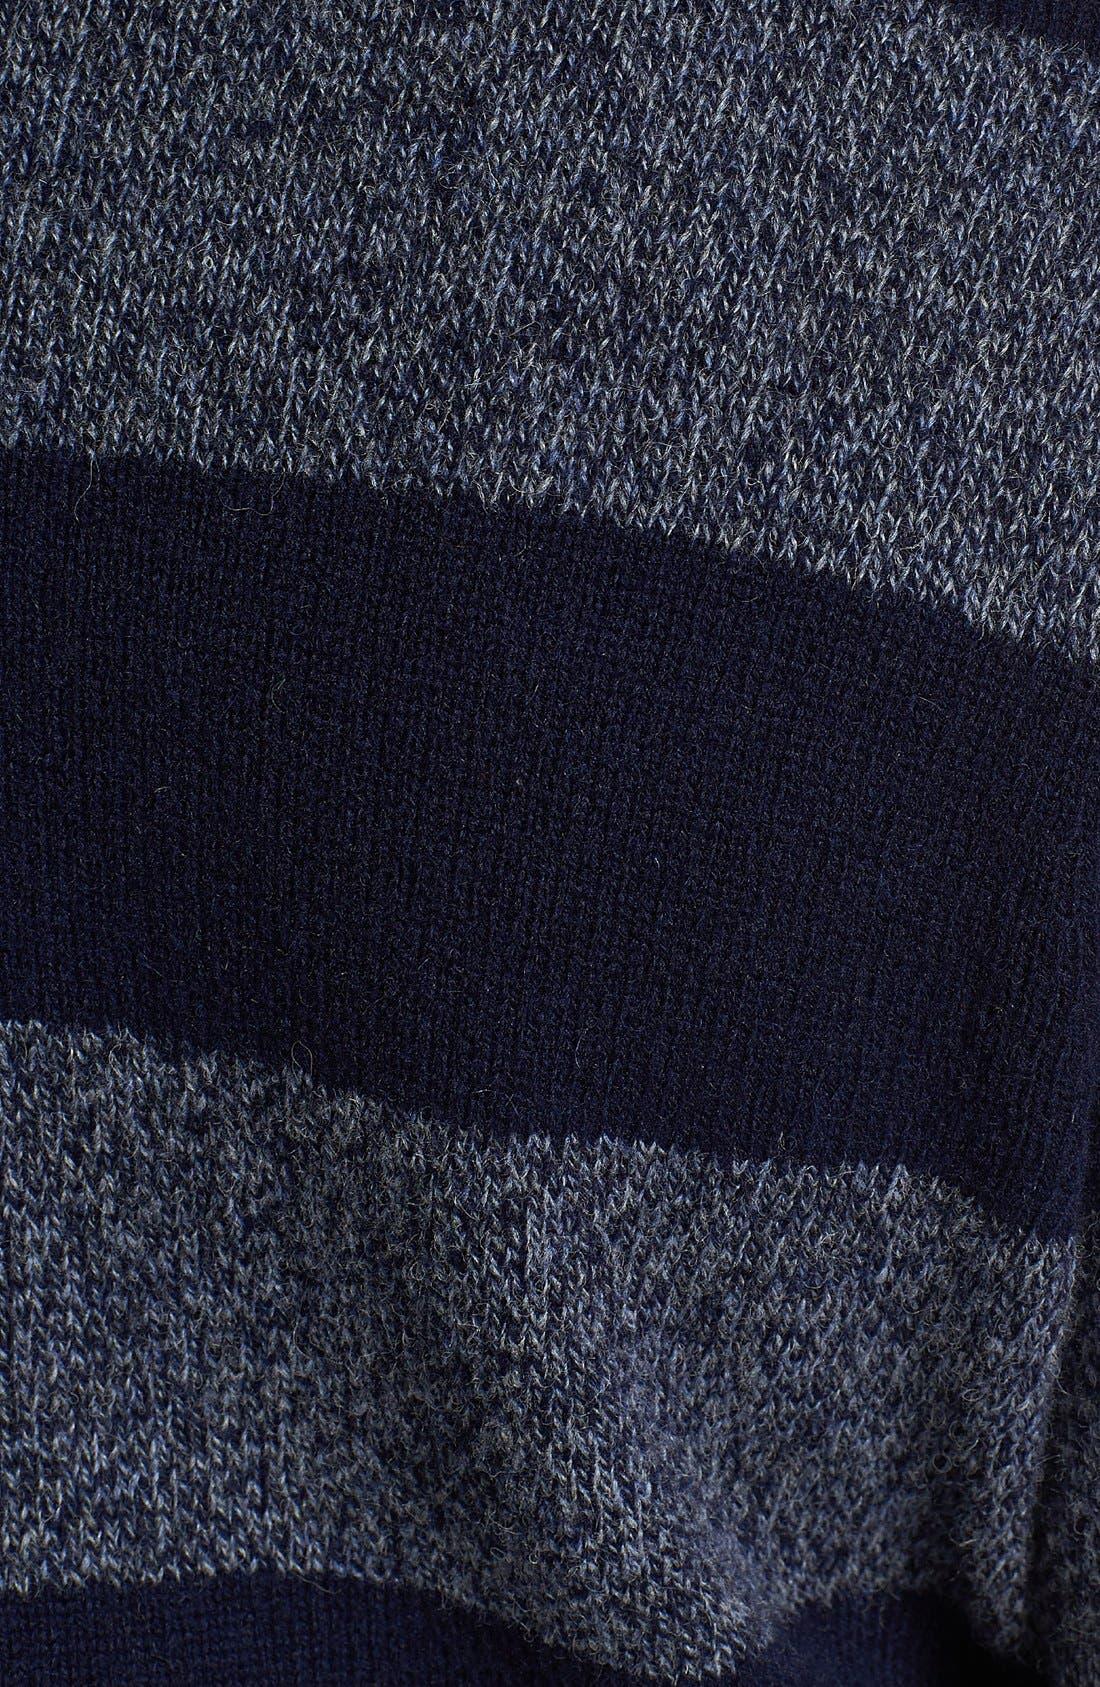 SHIPLEY & HALMOS, 'Earnest' Stripe Wool Shawl Collar Sweater, Alternate thumbnail 3, color, 415